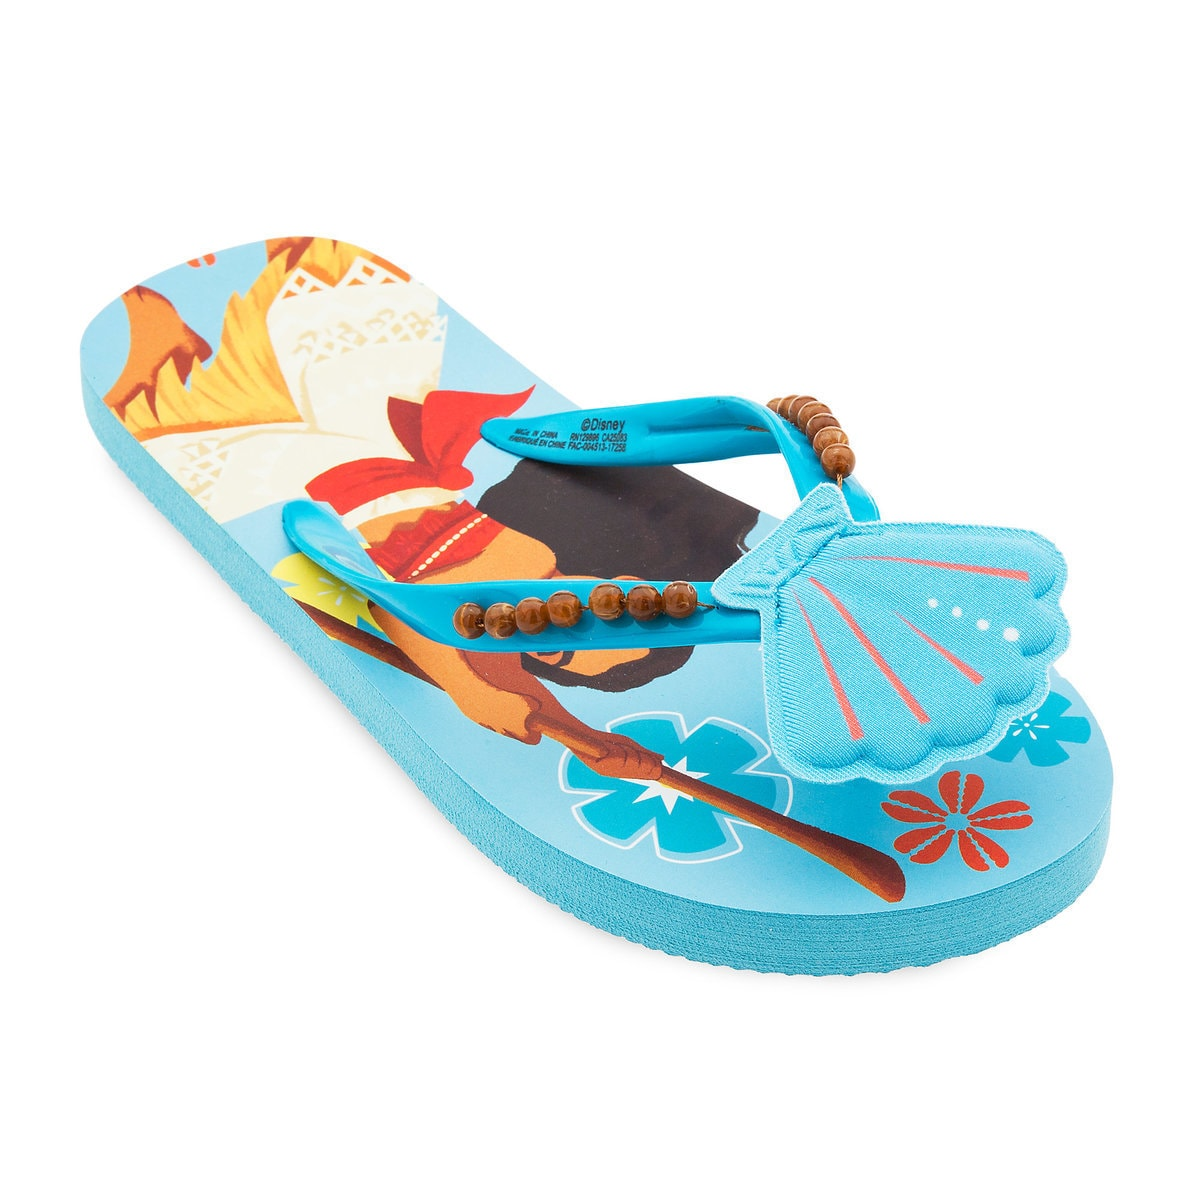 38cab1afa51d4 Product Image of Moana Flip Flops for Kids   1